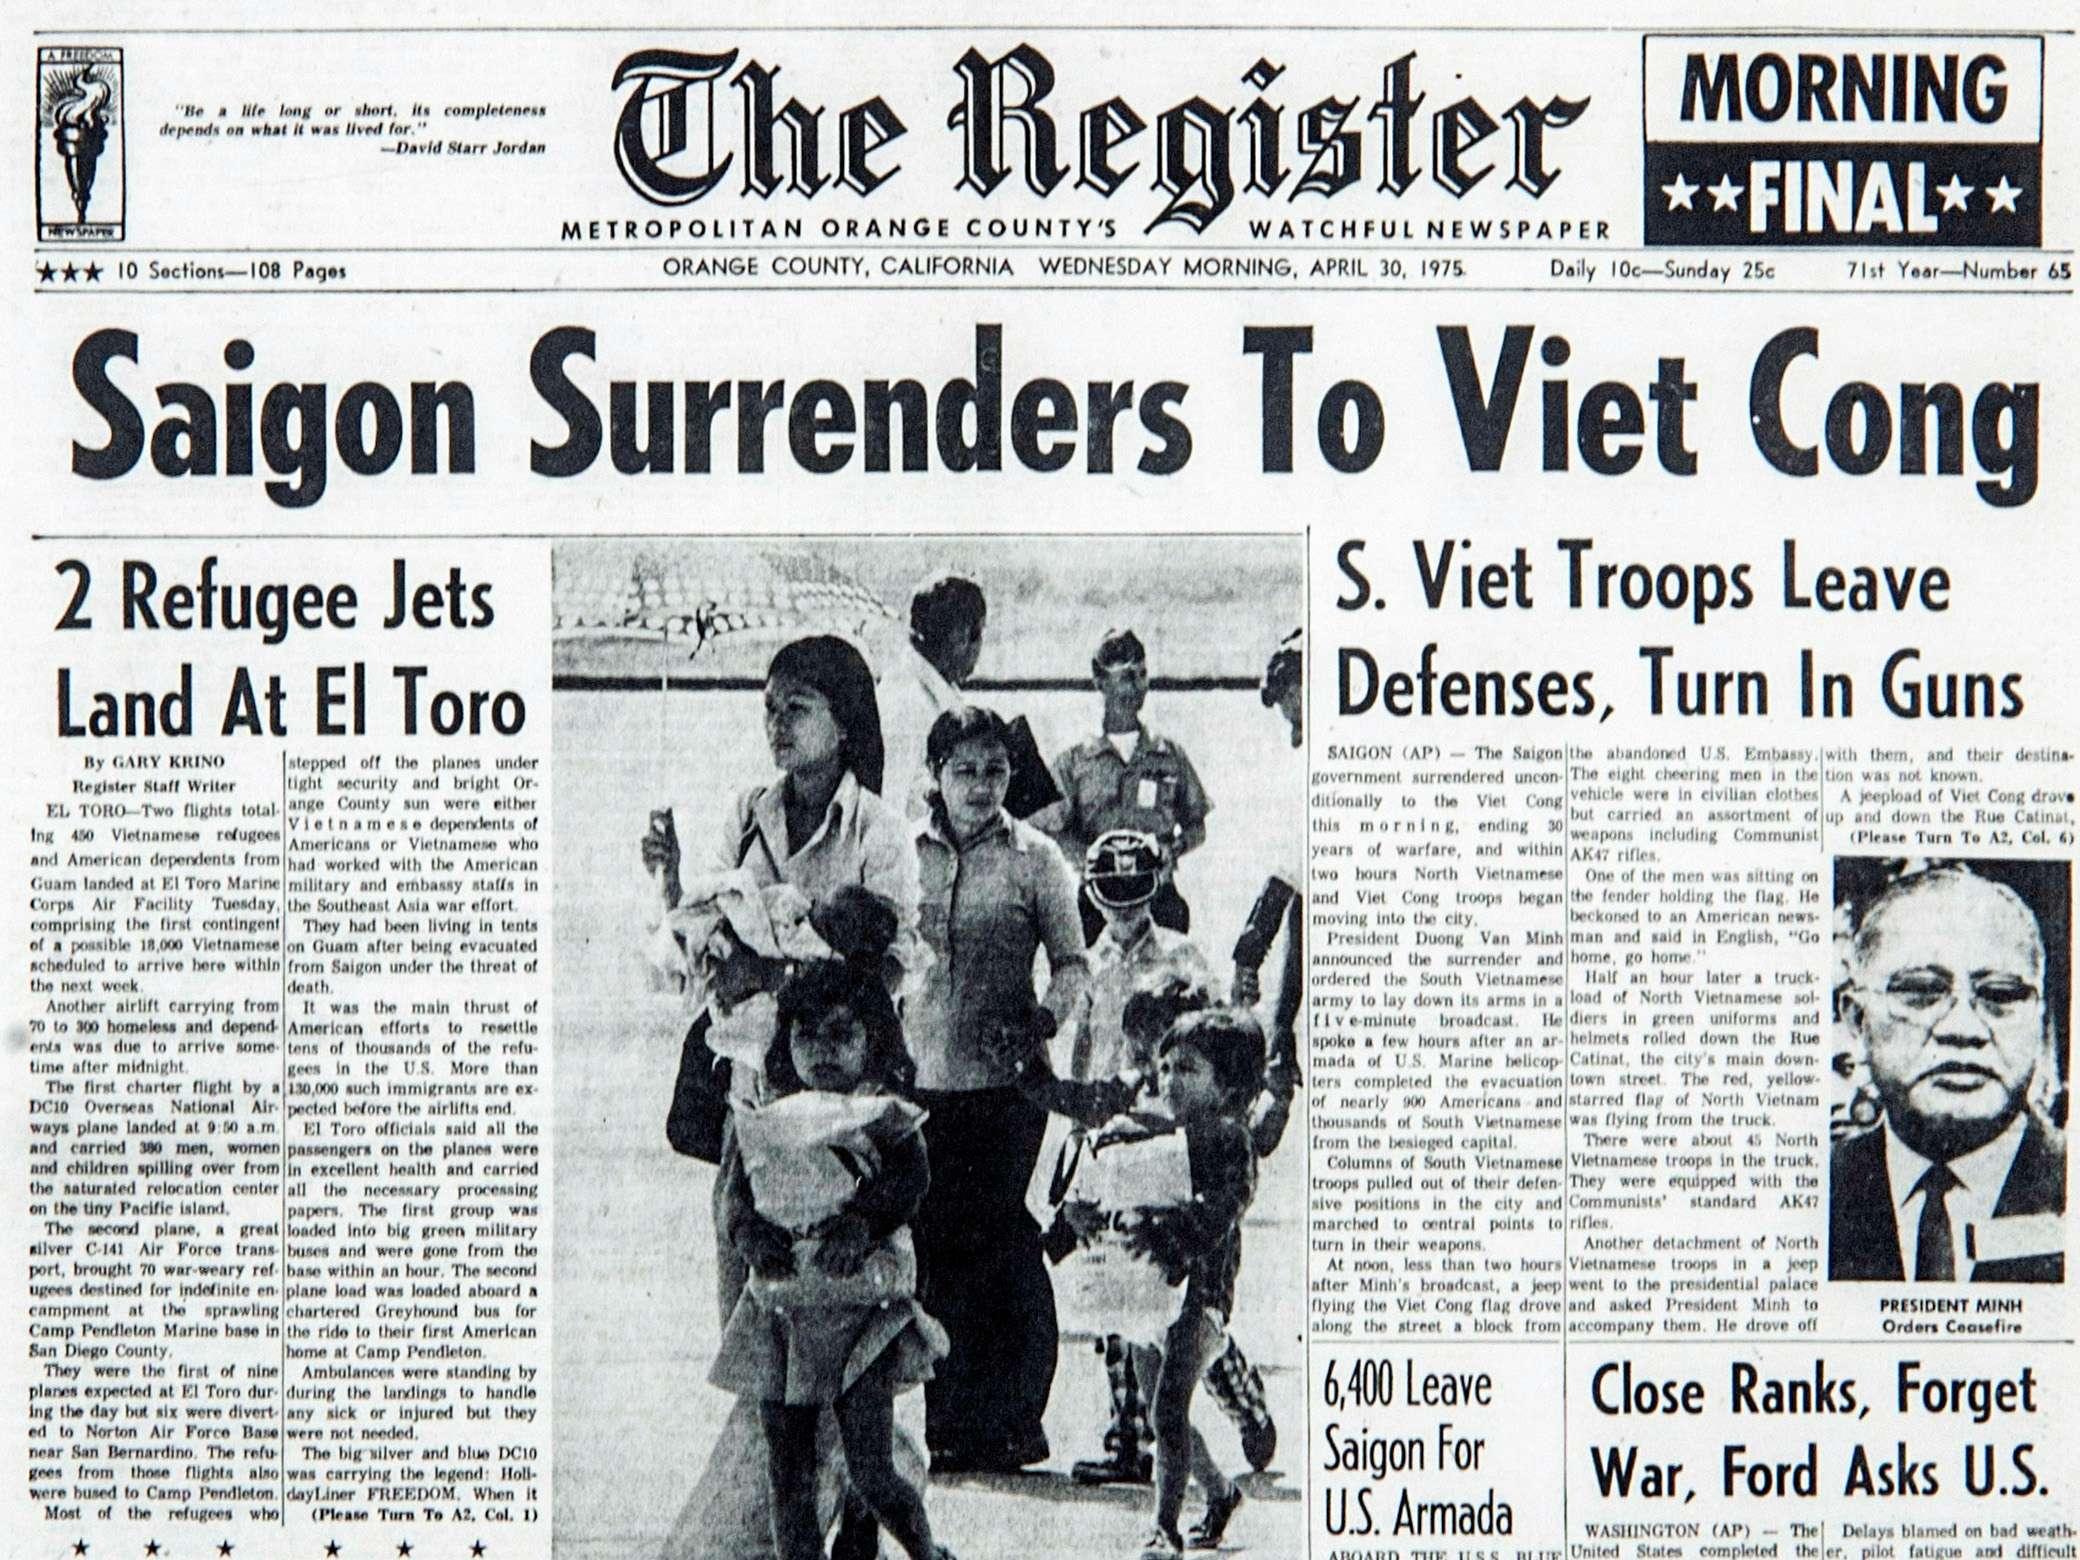 Saigon Surrenders